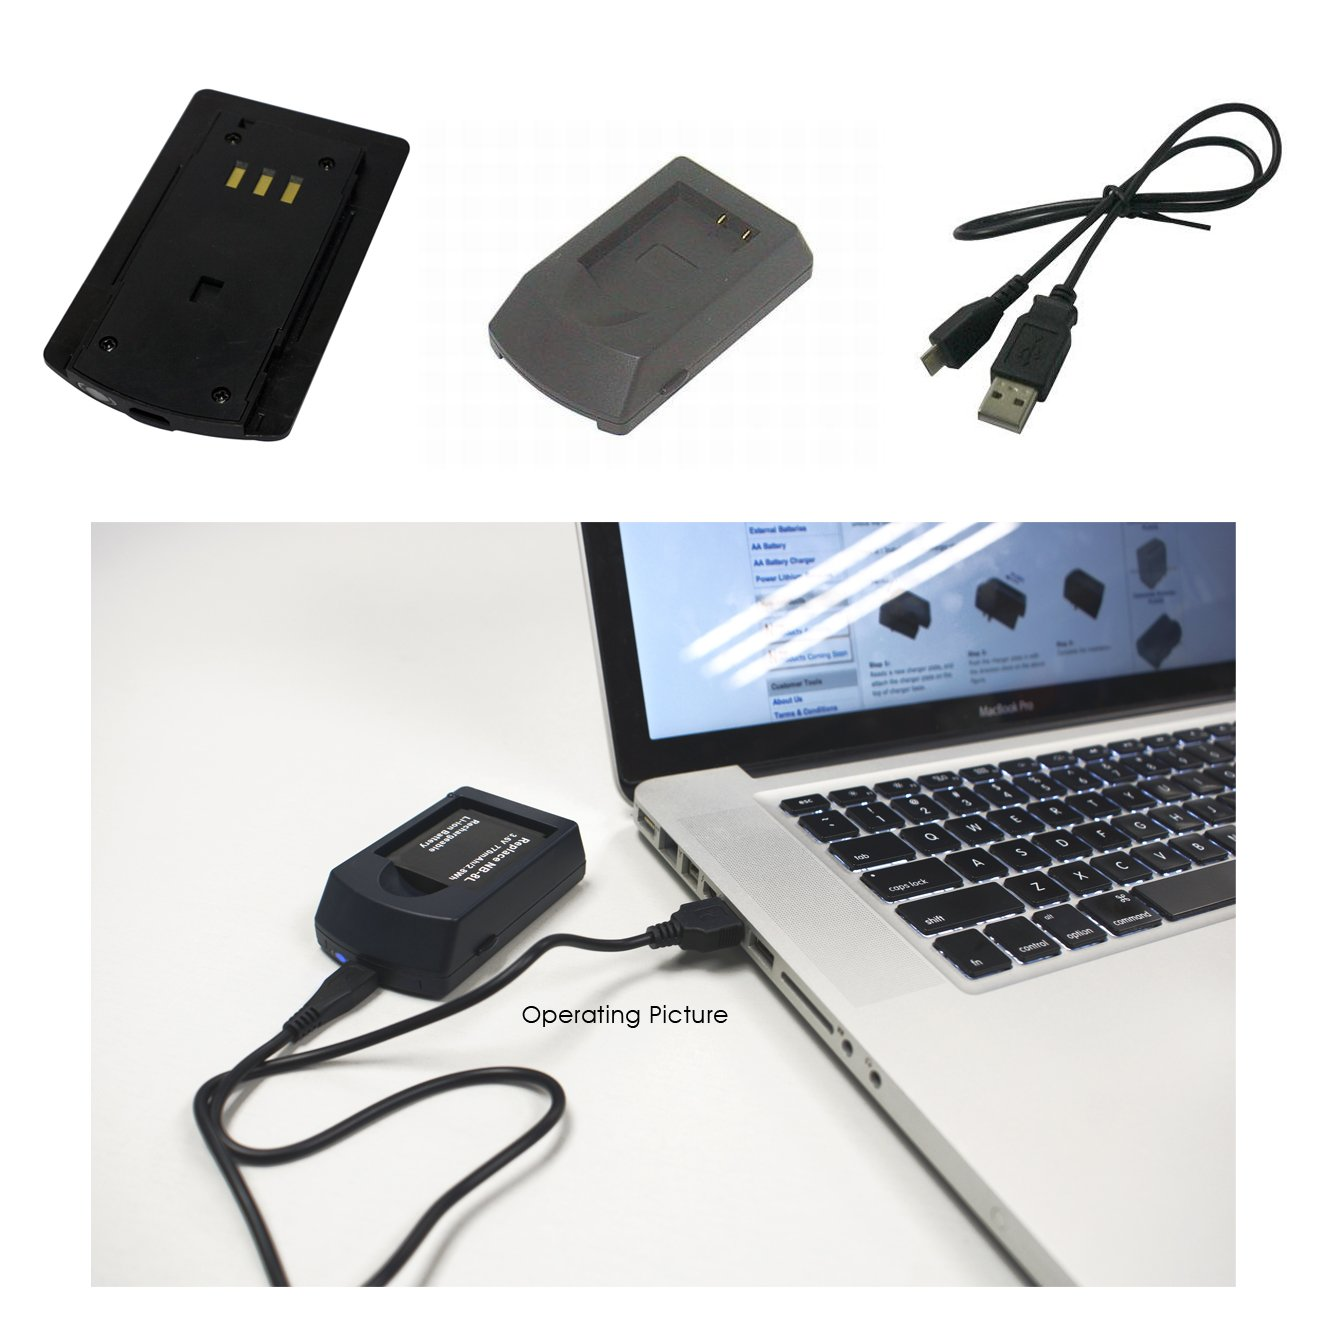 PowerSmart - Cargador para Fujifilm FinePix F440 Zoom, F440 ...